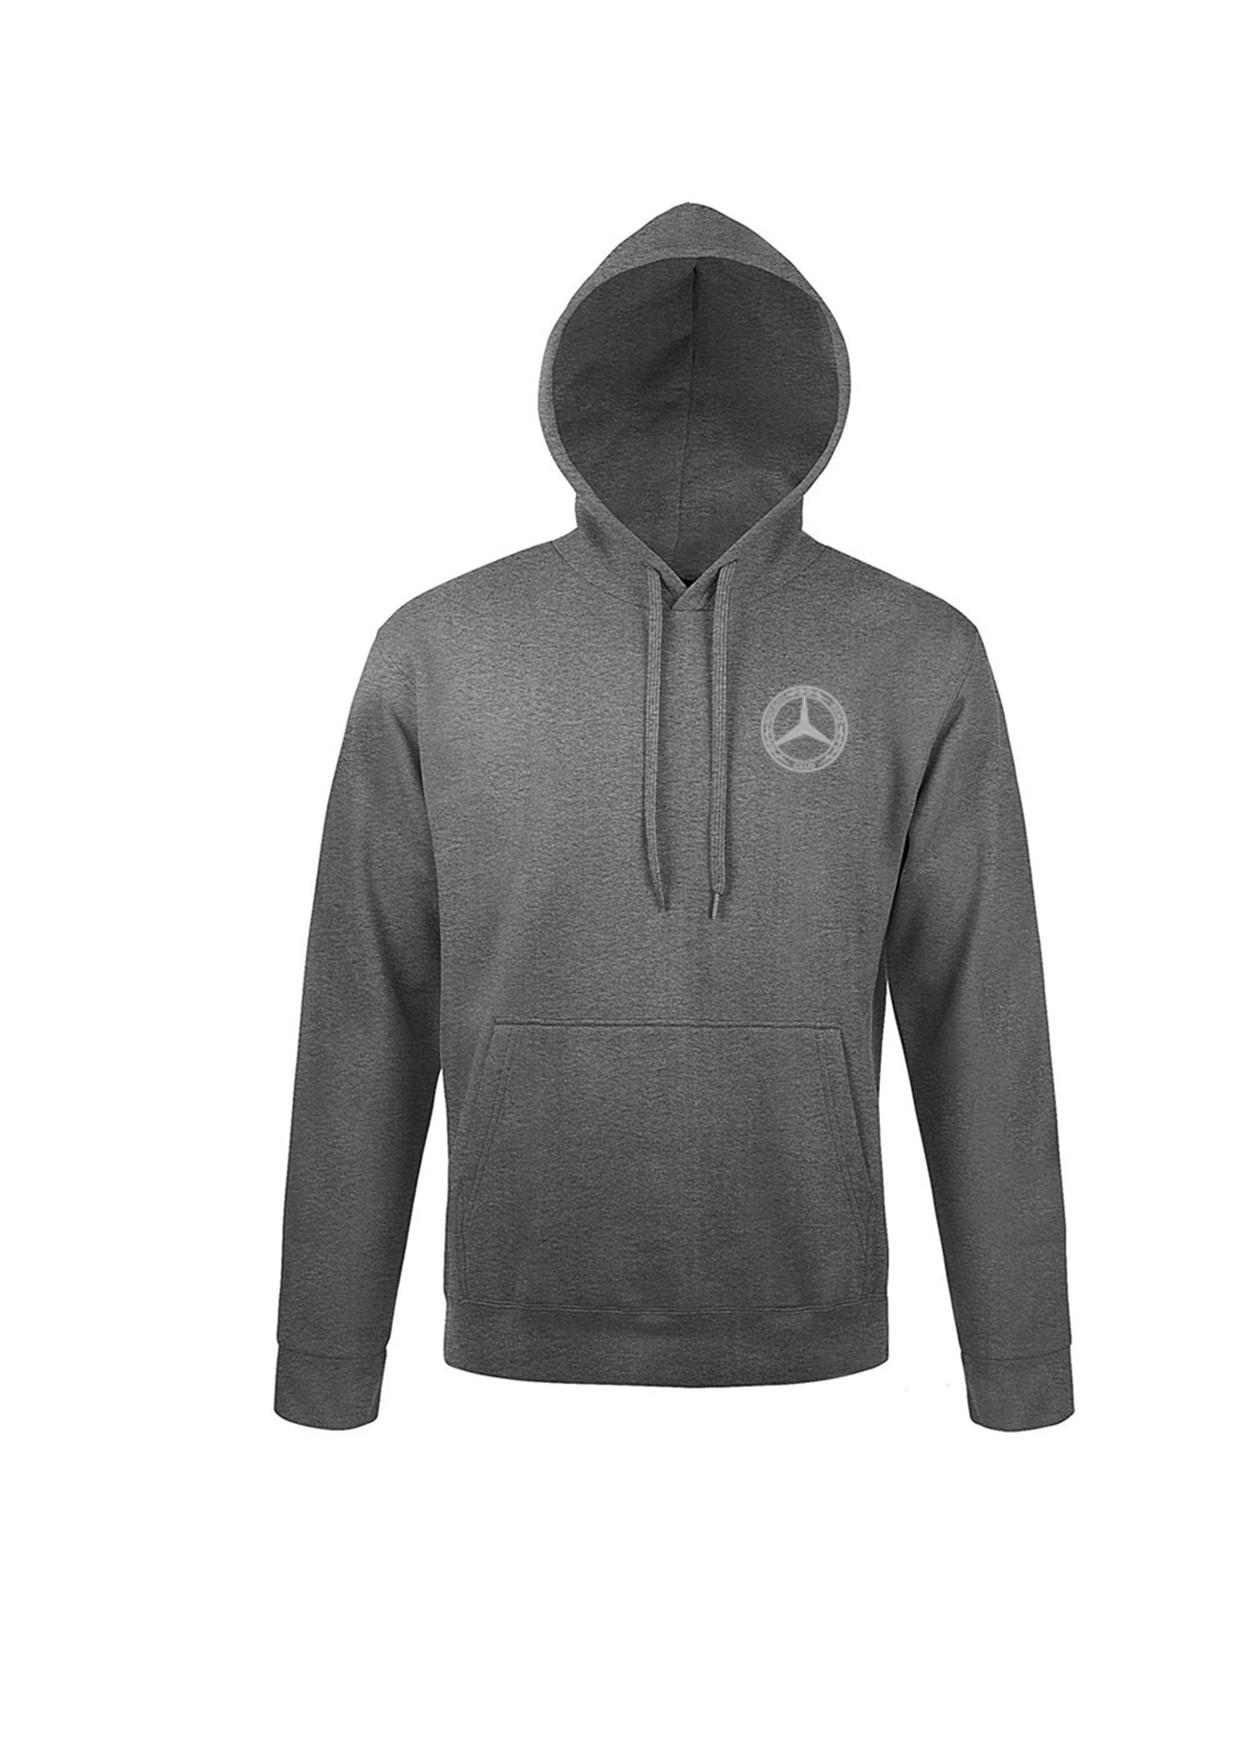 Mercedes-Benz Club Unisex Hooded Sweatshirt Charcoal Marl